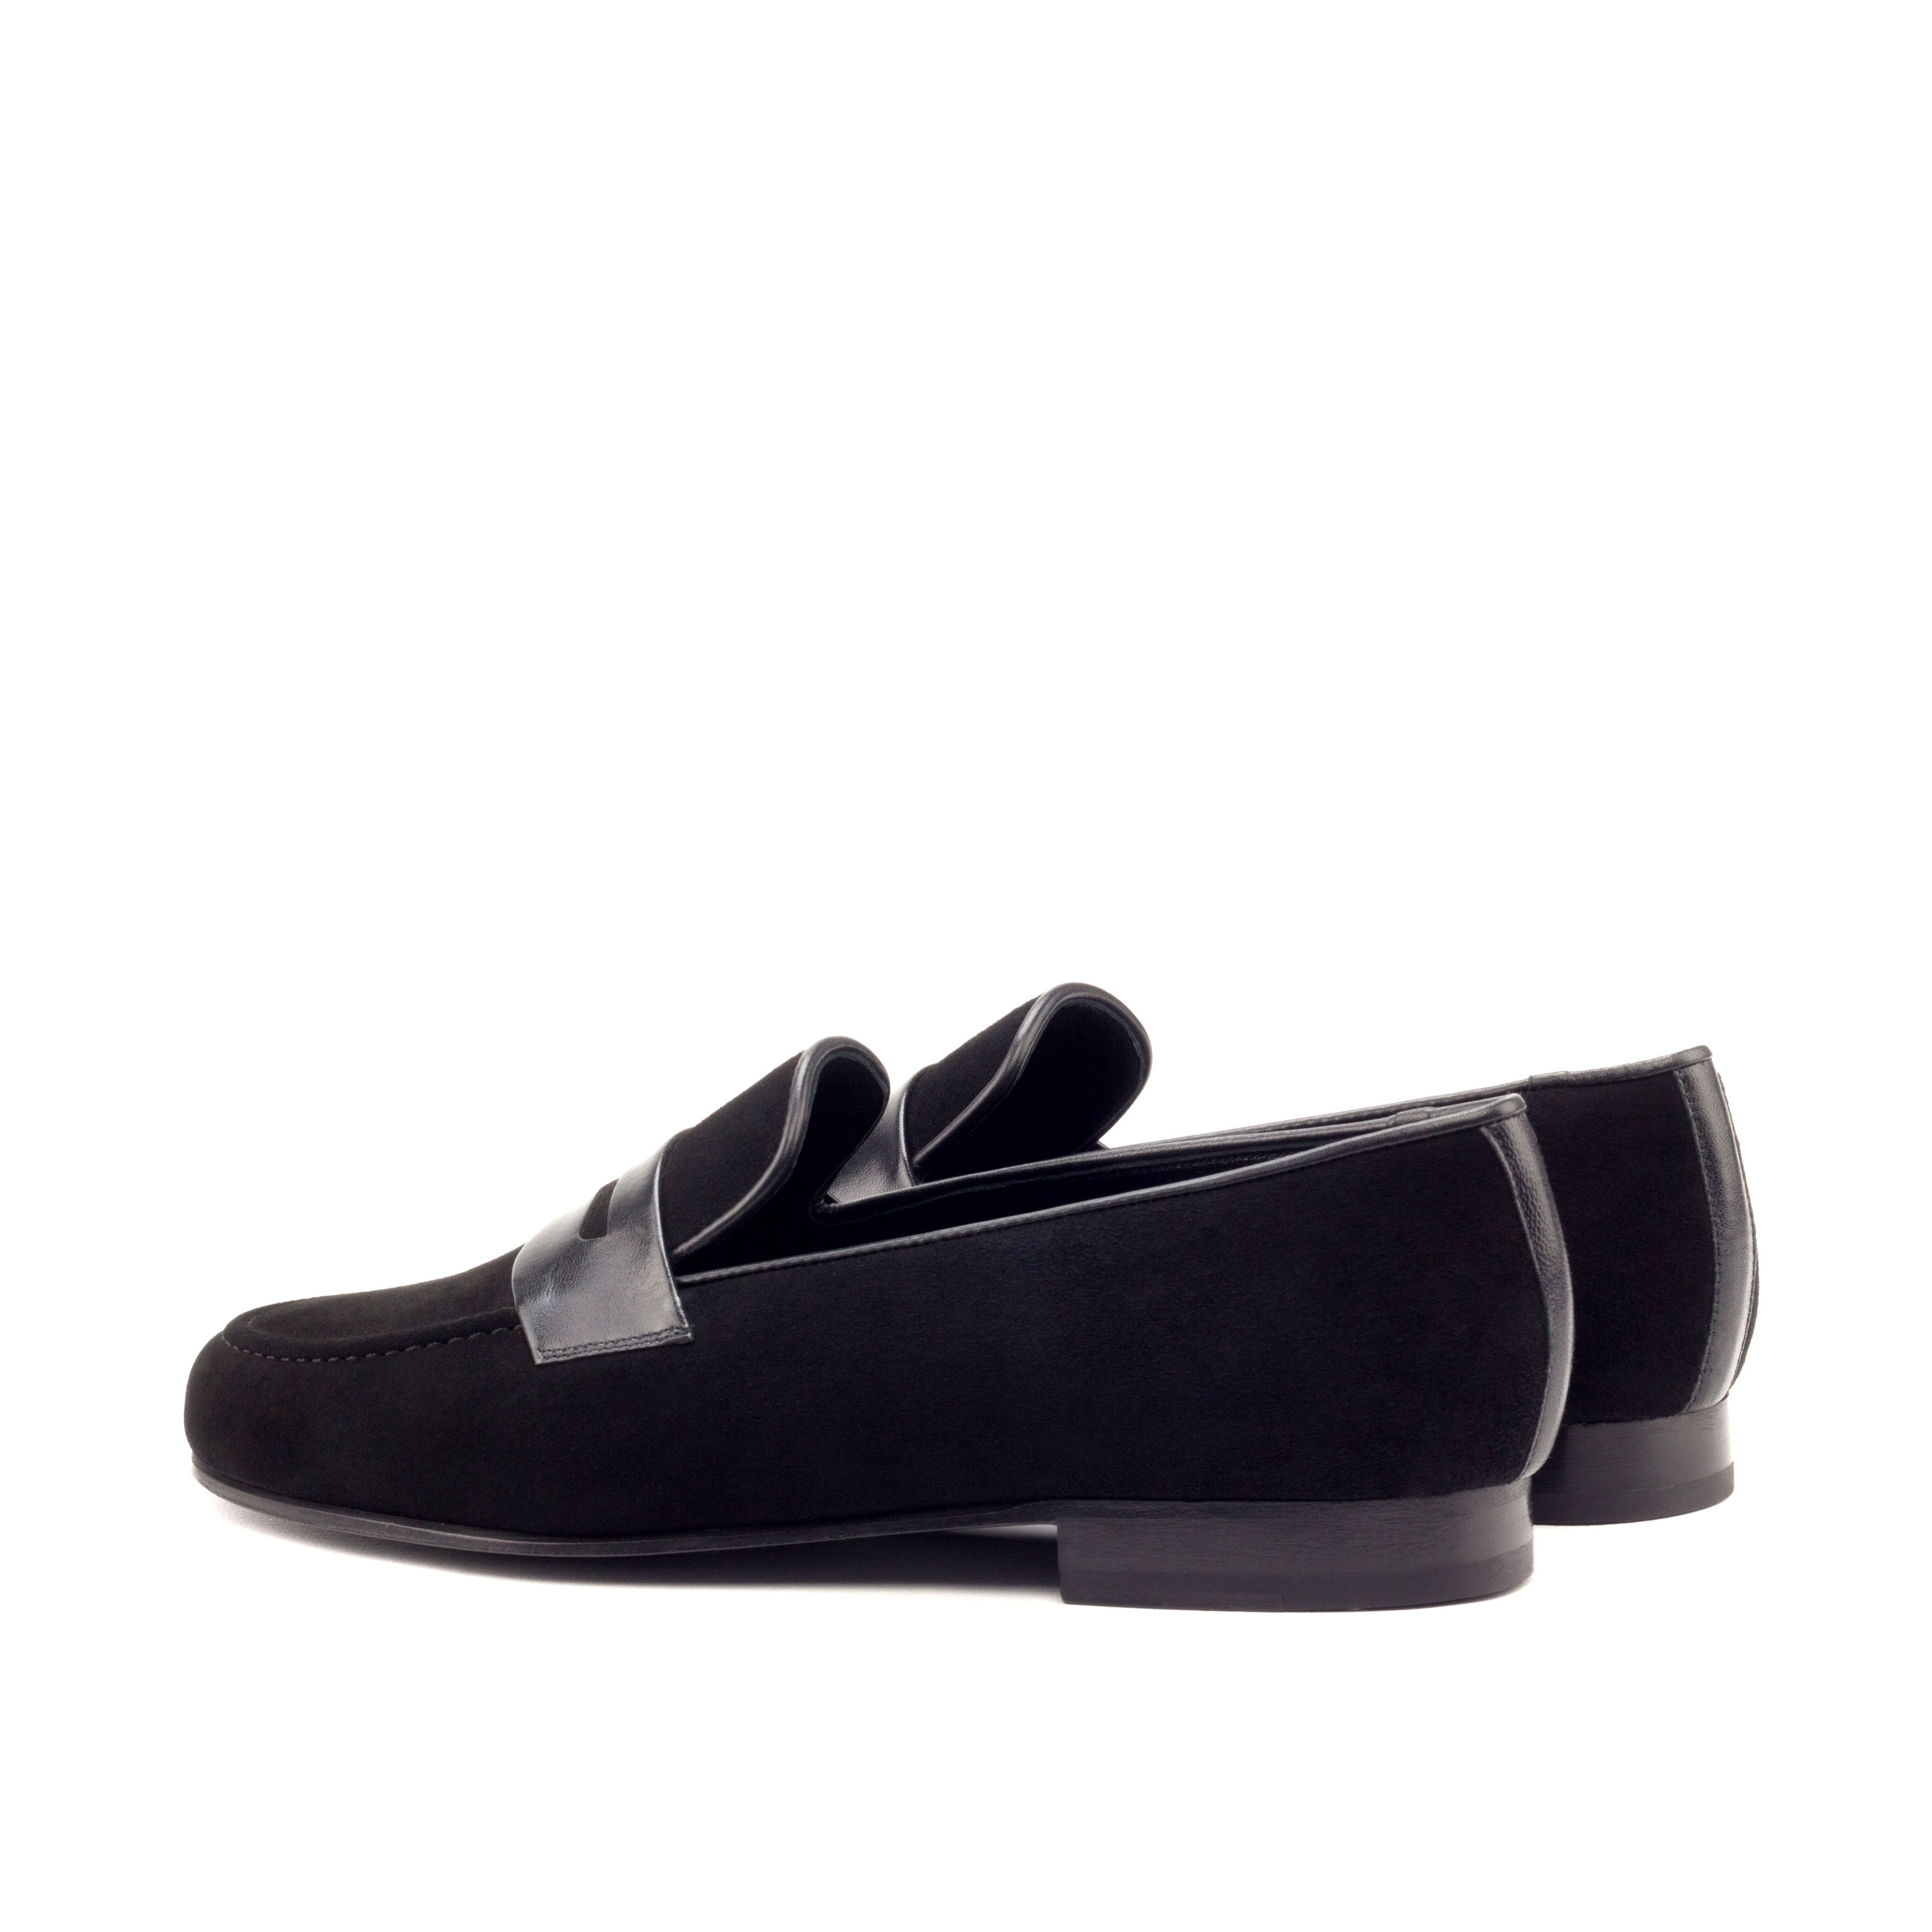 Wellington Albert Mask – Black Suede-Black Leather-Ang6